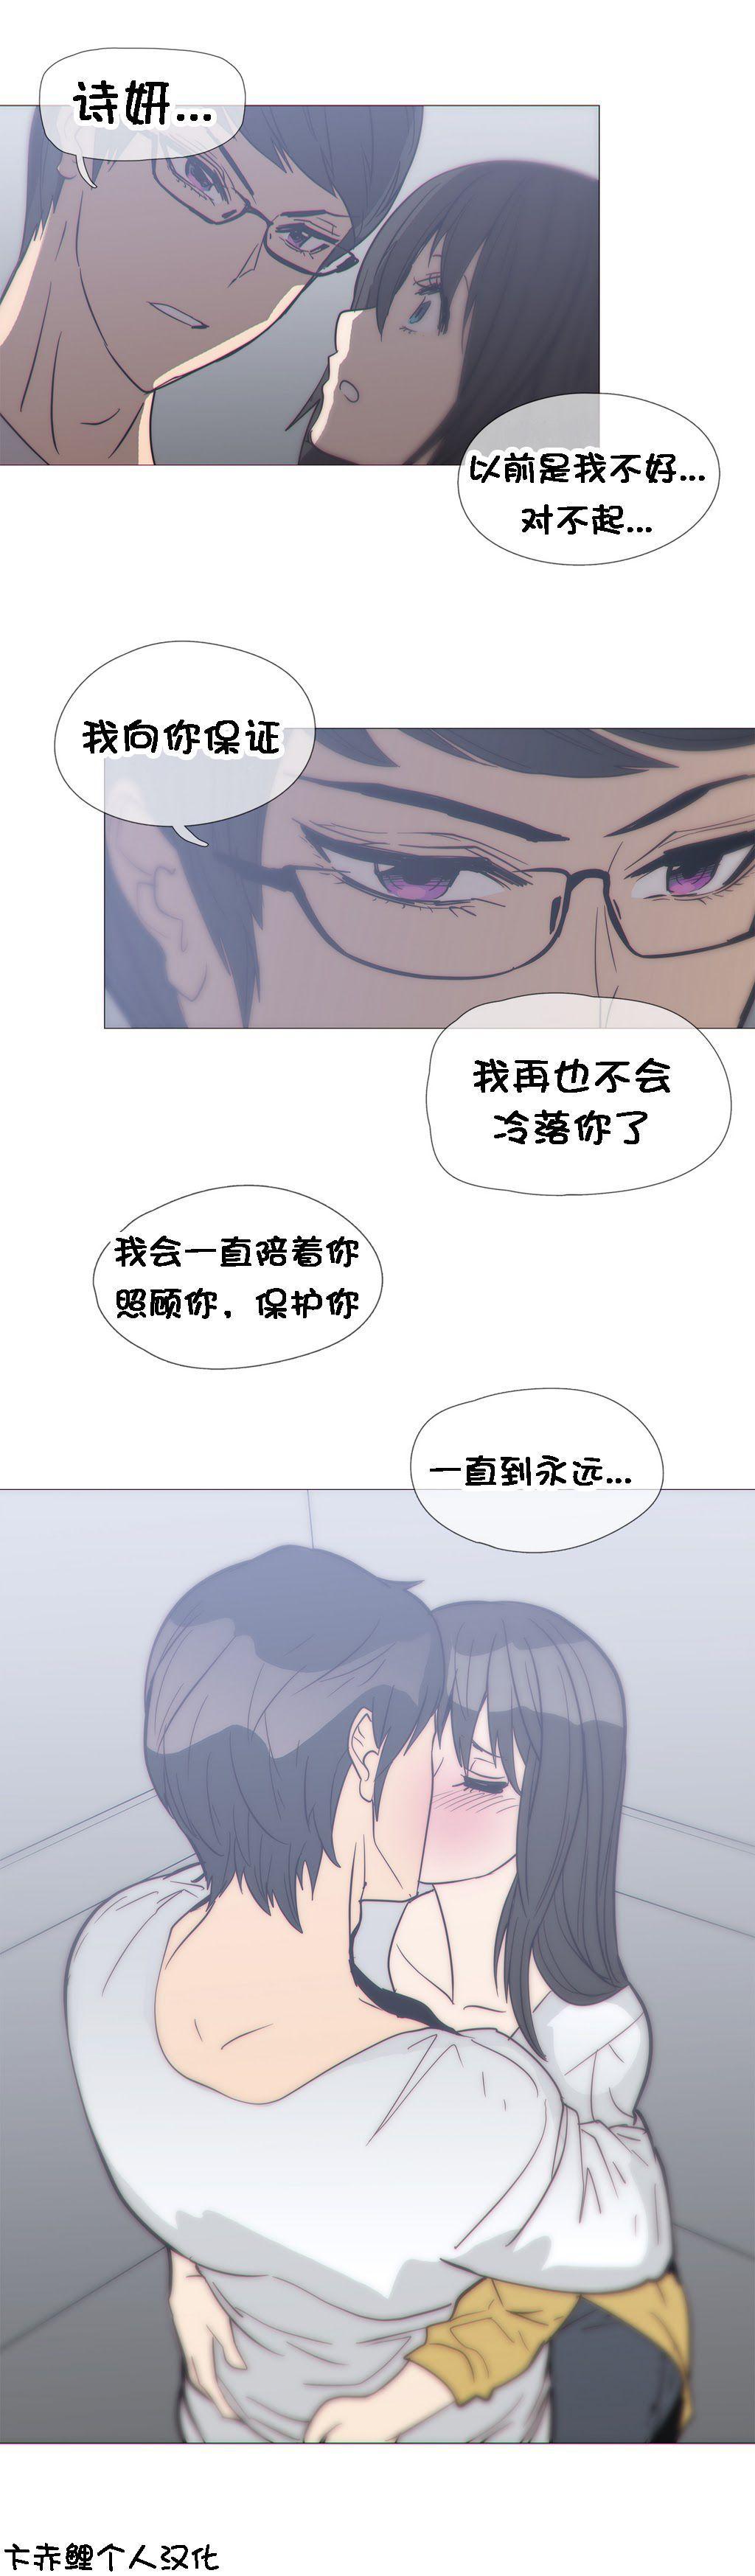 HouseHold Affairs 【卞赤鲤个人汉化】1~33话(持续更新中) 589